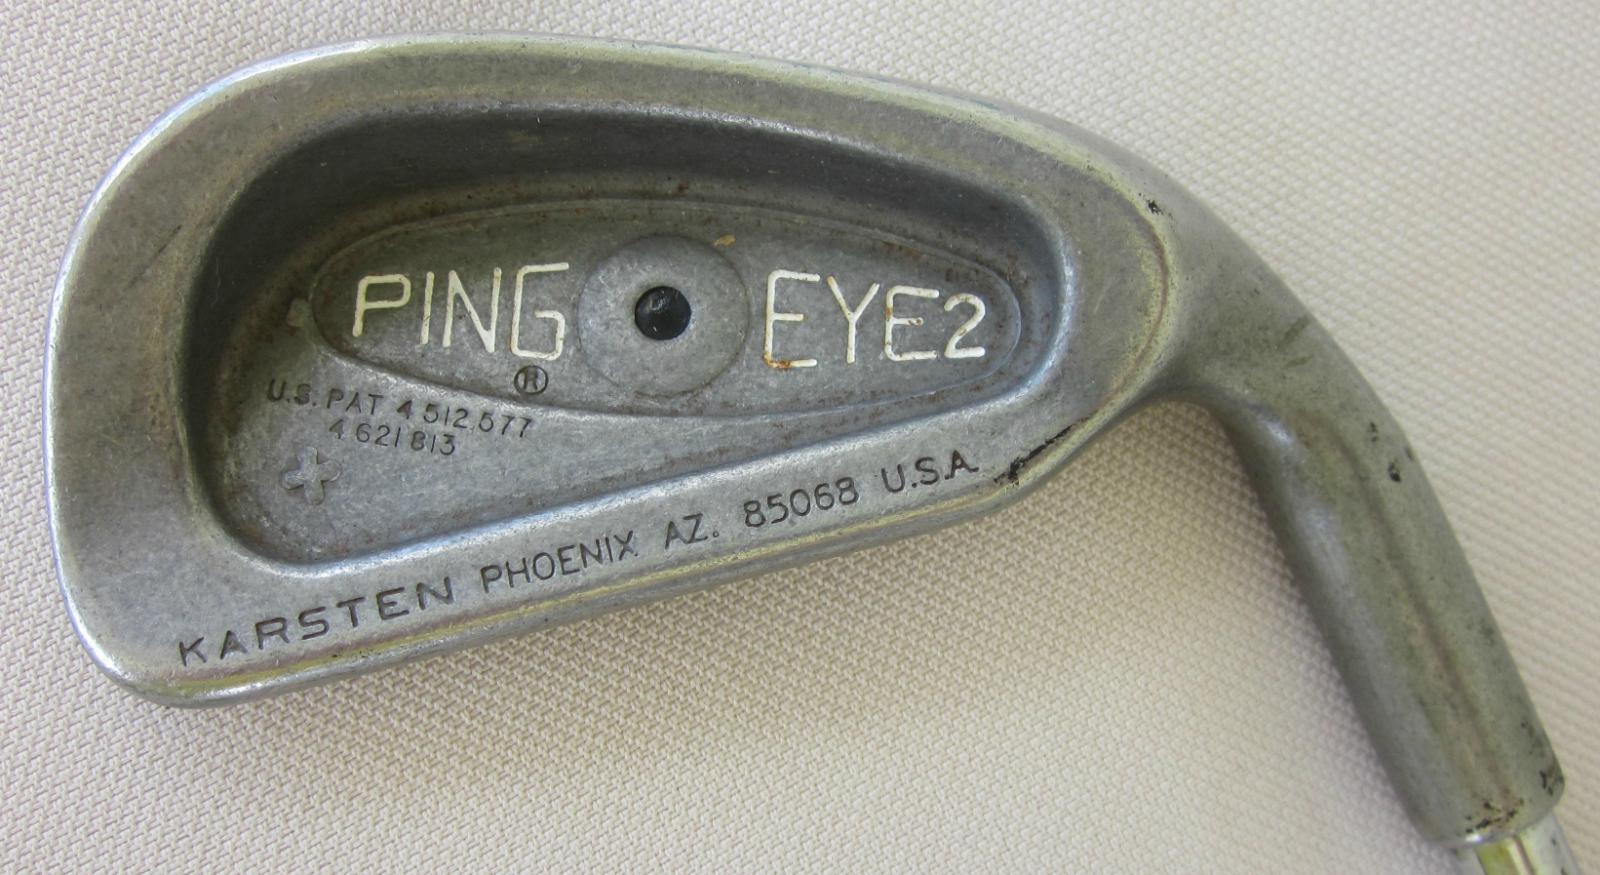 Ping Eye 2+ Punto Negro Hierro  2 Original ZZ Lite Eje De Acero  muchas sorpresas